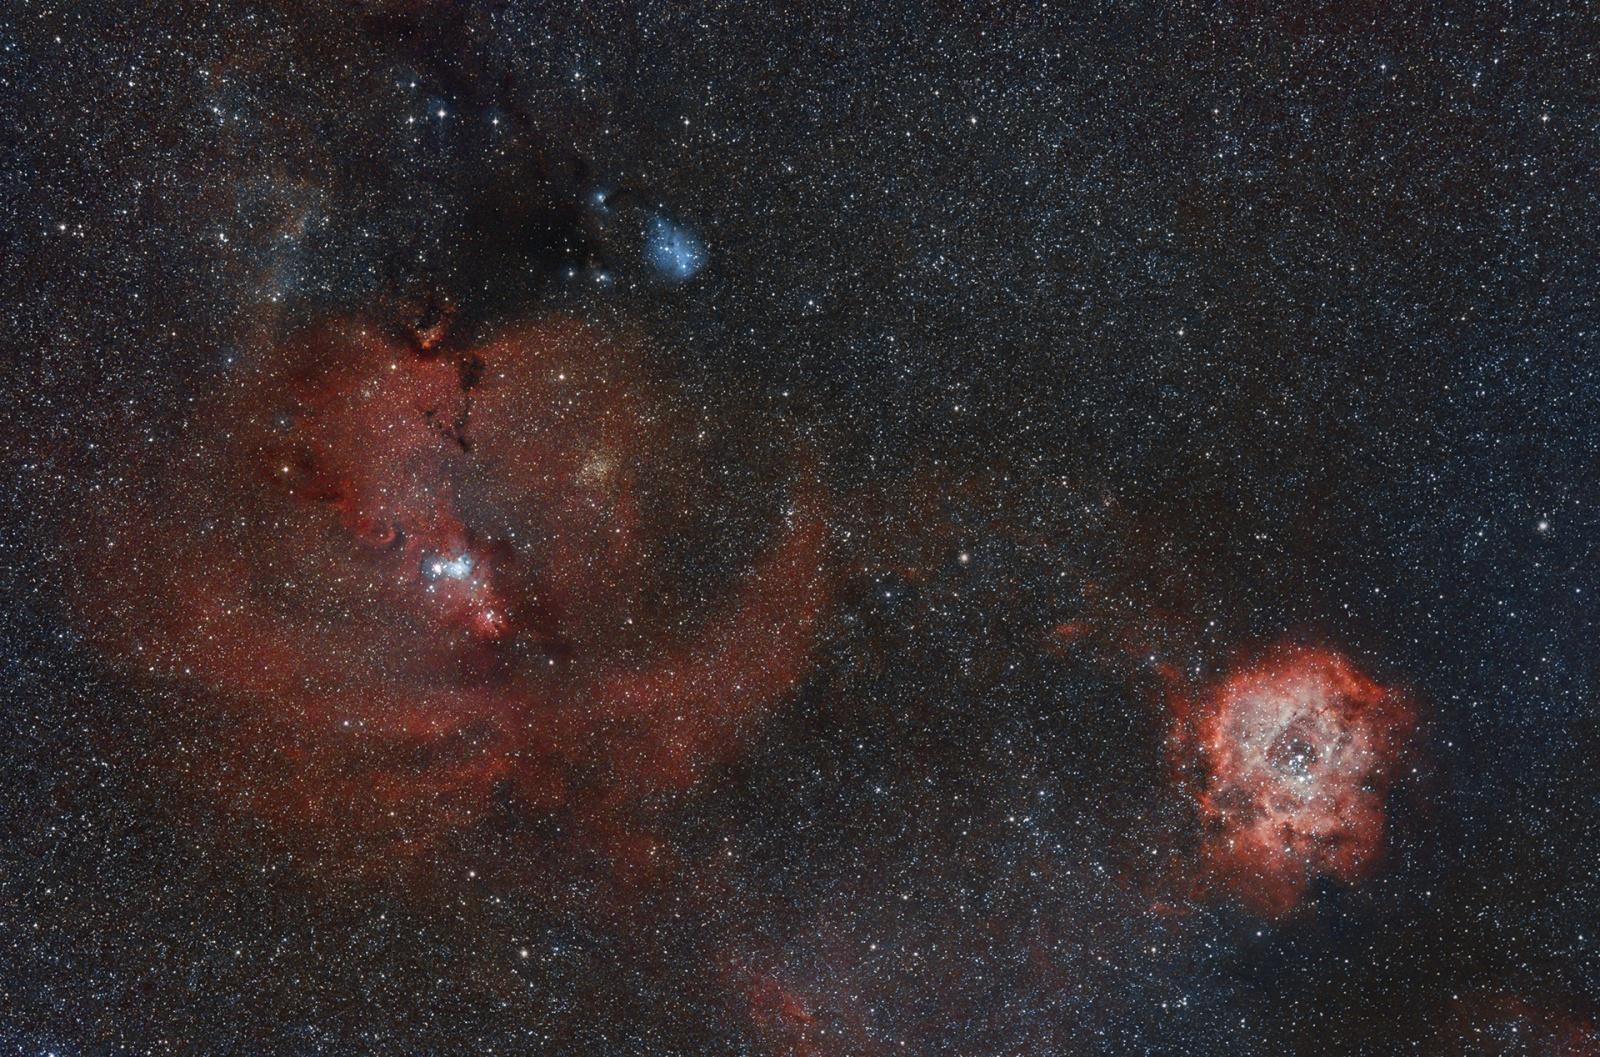 1488040628_NGC2264_NGC2237.thumb.jpg.e7e09e1f5ba71f395838e9db88bb8c47.jpg